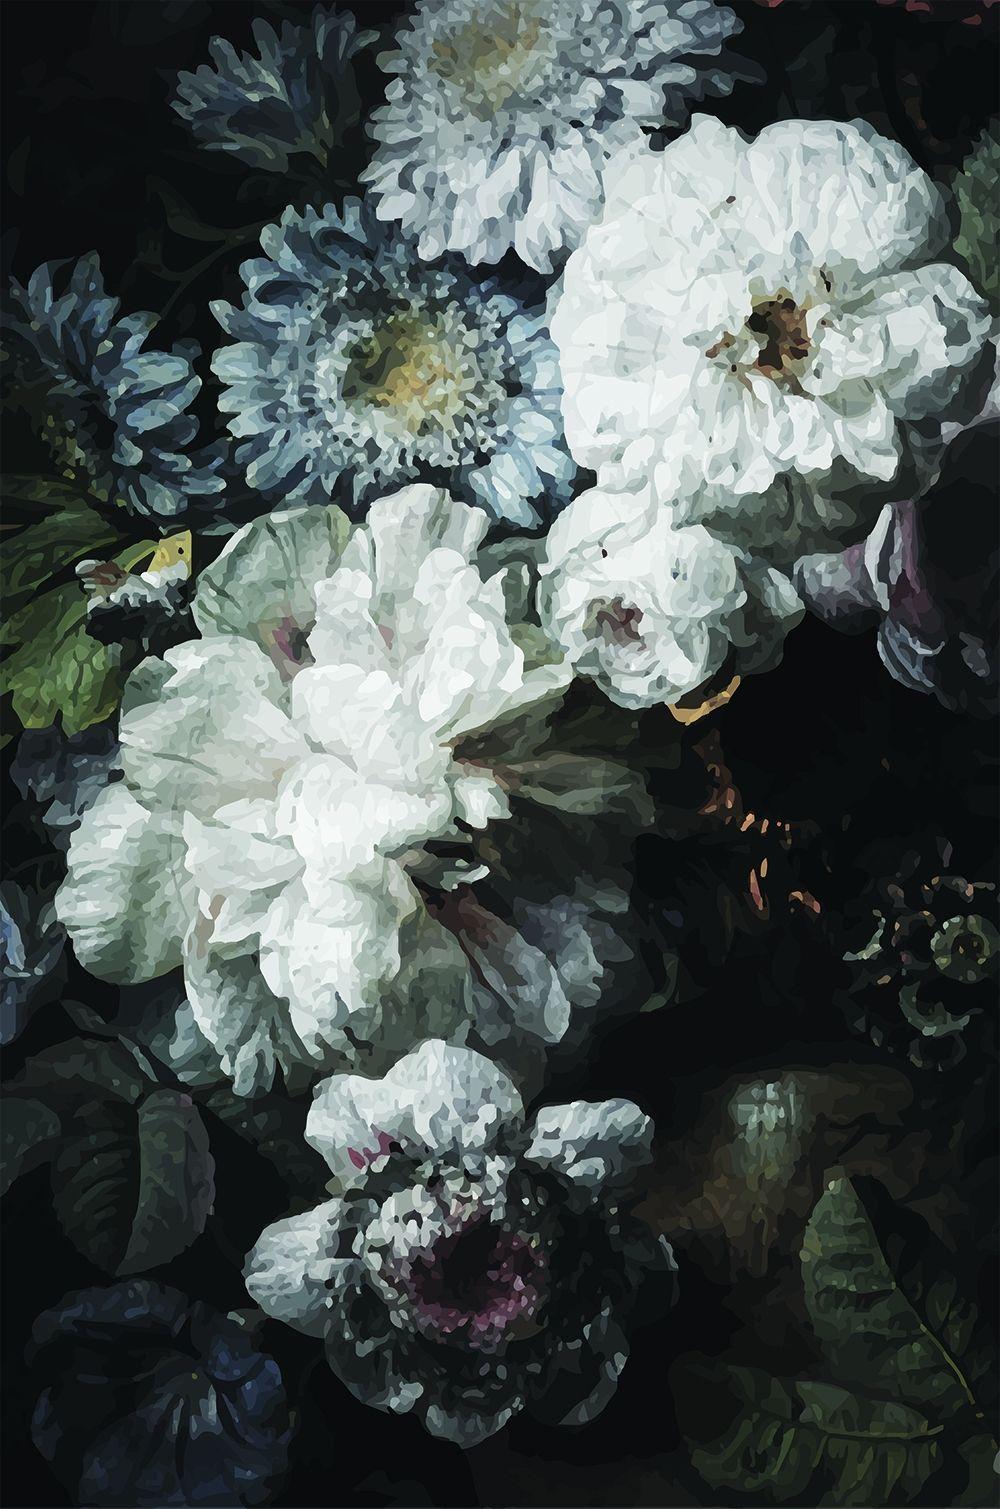 Dark Floral Wallpaper In 2020 Vintage Floral Wallpapers Floral